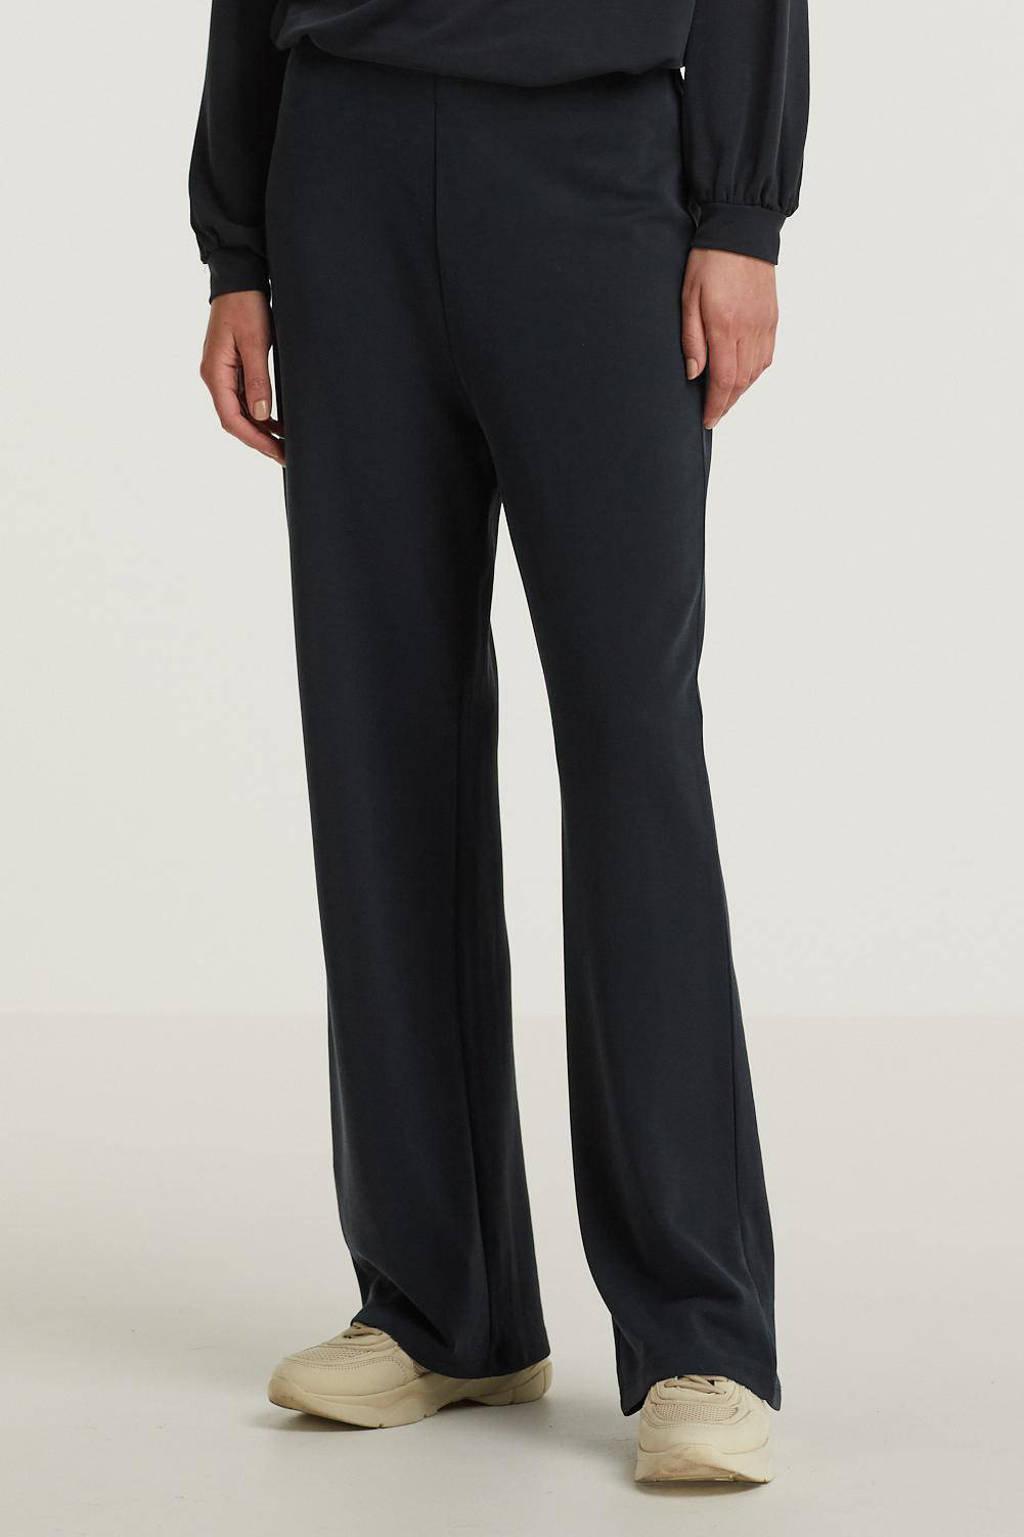 Peppercorn wide leg palazzo broek Lana zwart, Zwart